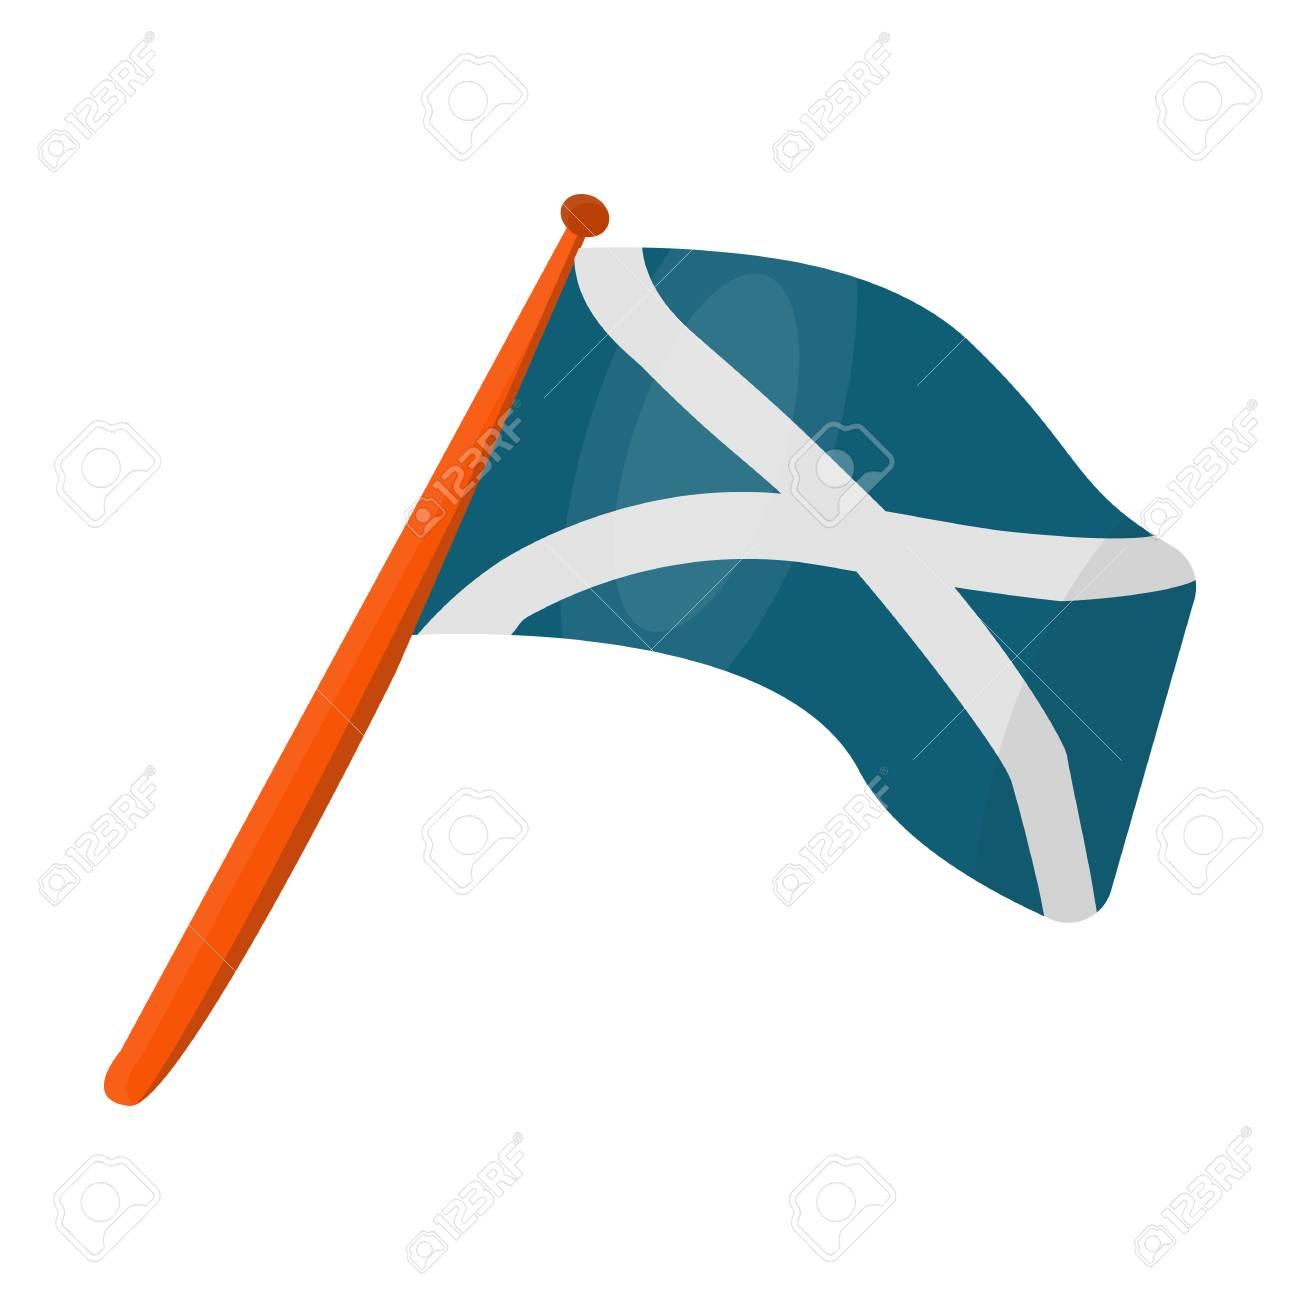 Scotland Flag On A Wooden Stick The Scottish National Flag Scotland